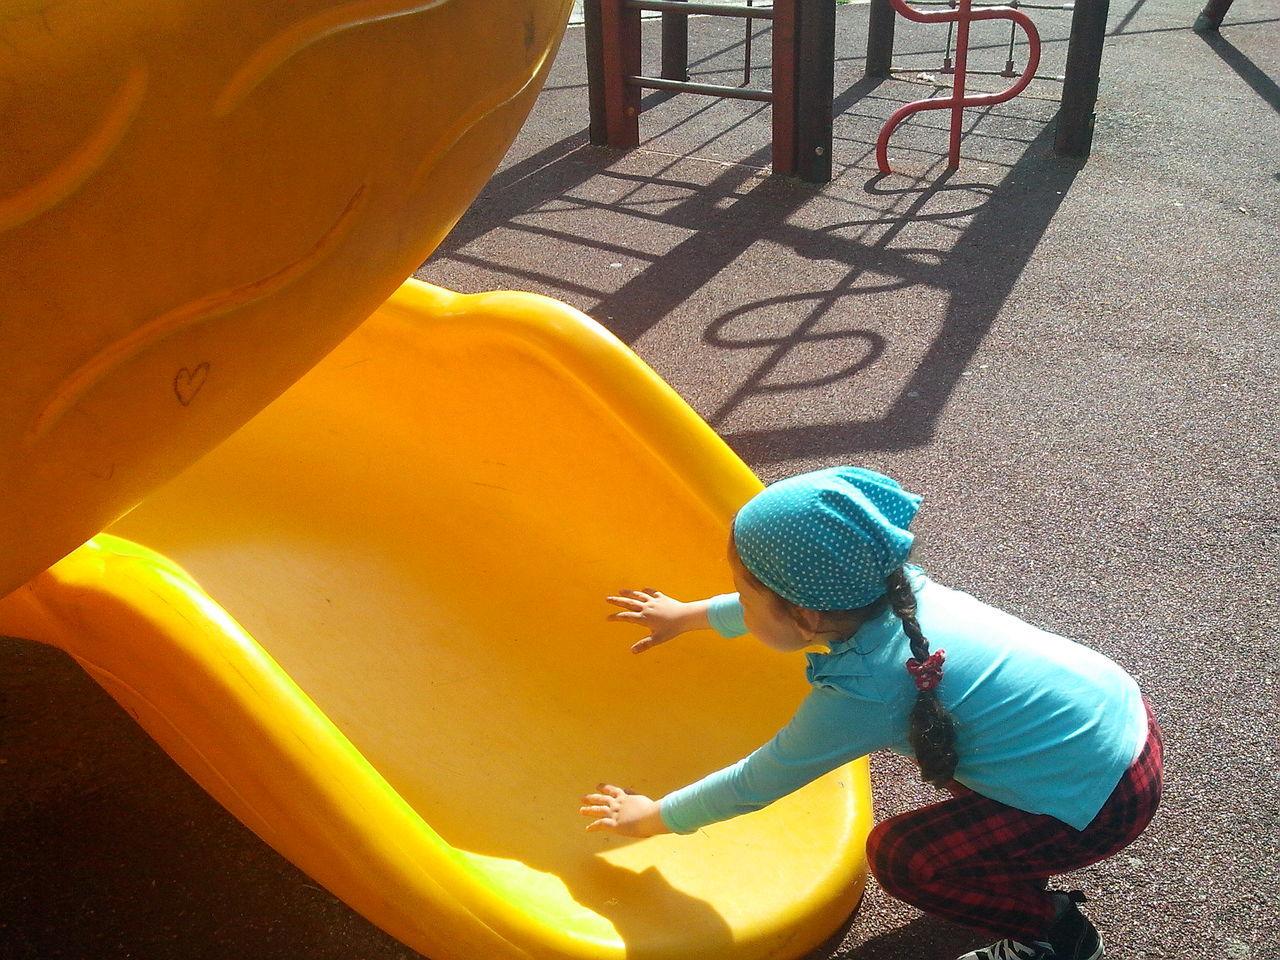 Yellow Playgrounds Fun With Kids EyeEmNewHere